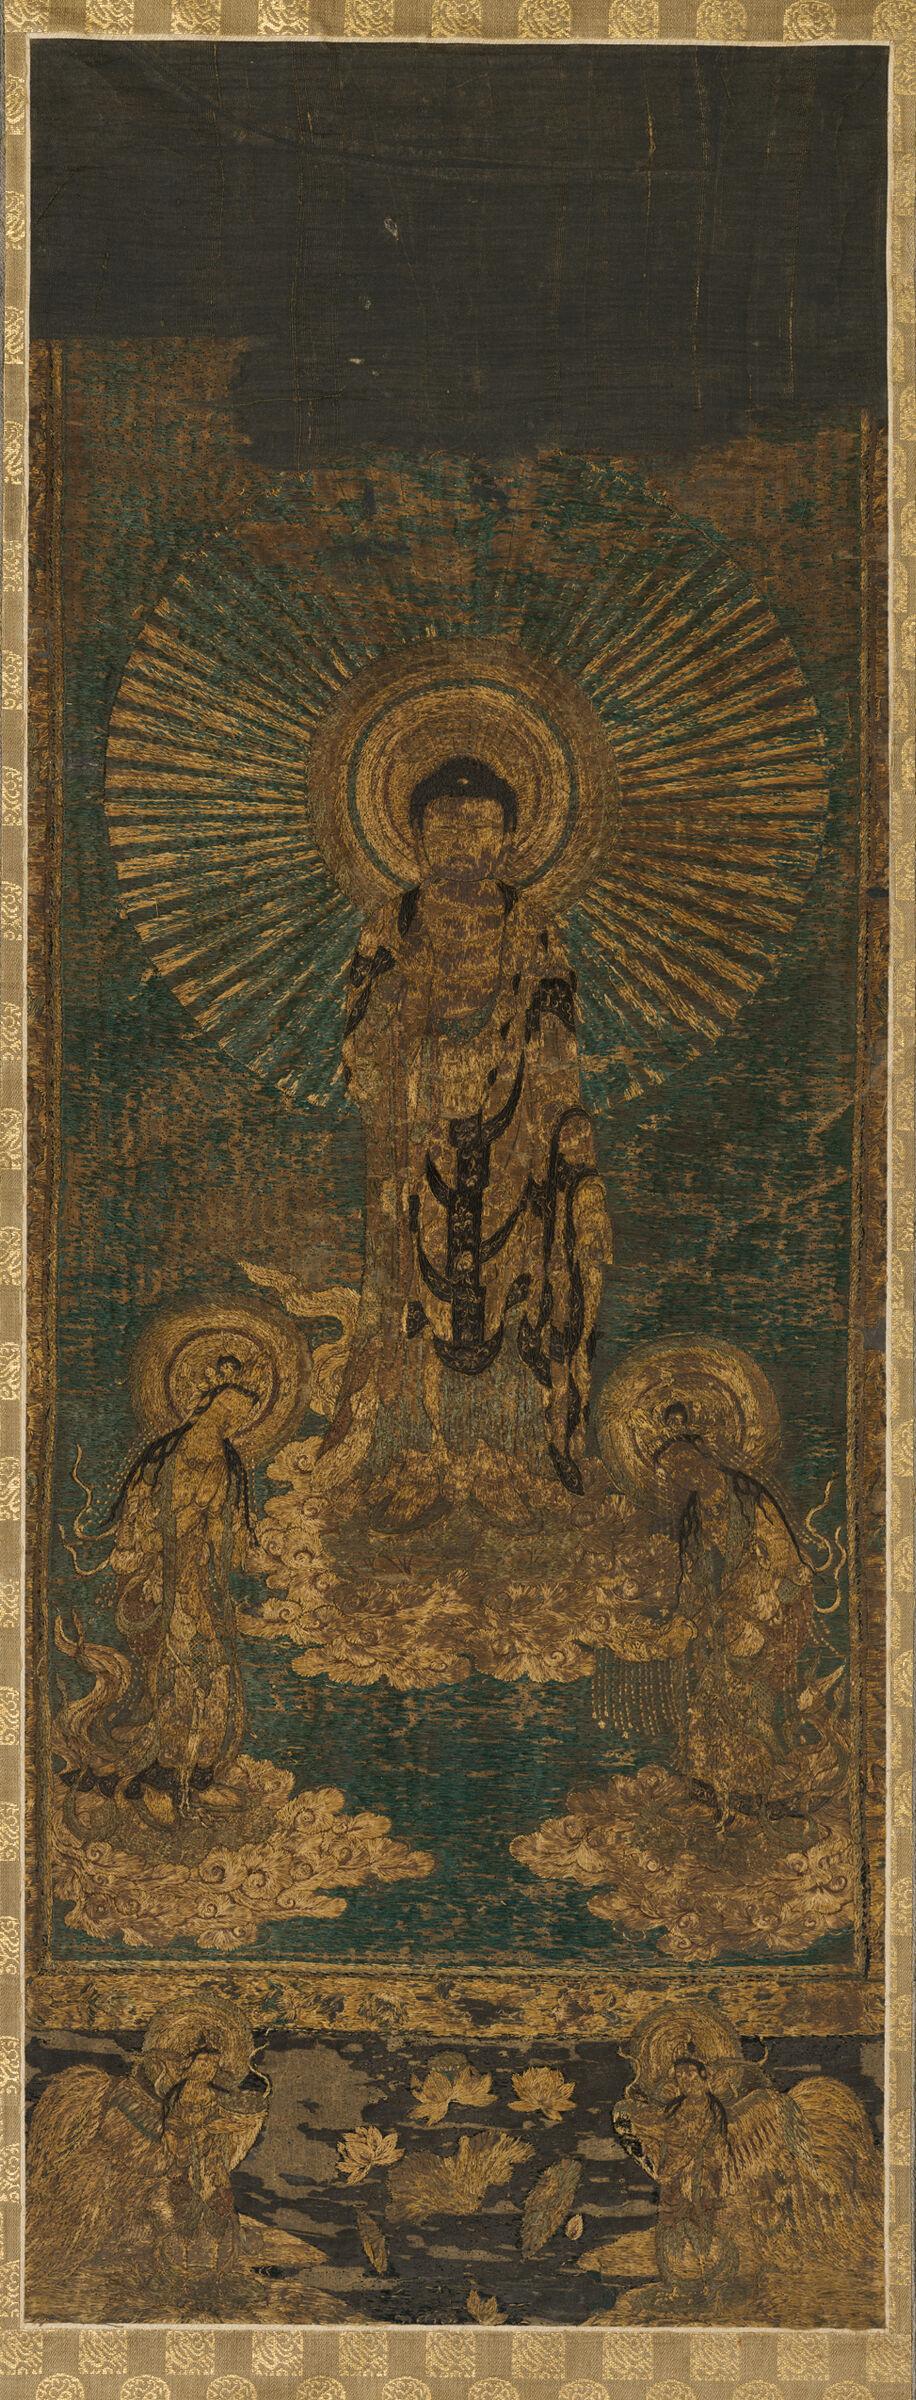 Descent Of The Buddha Amitabha And The Bodhisattvas Avalokitesvara And Mahâsthâmaprâpta (Amida Sanzon Raigô)